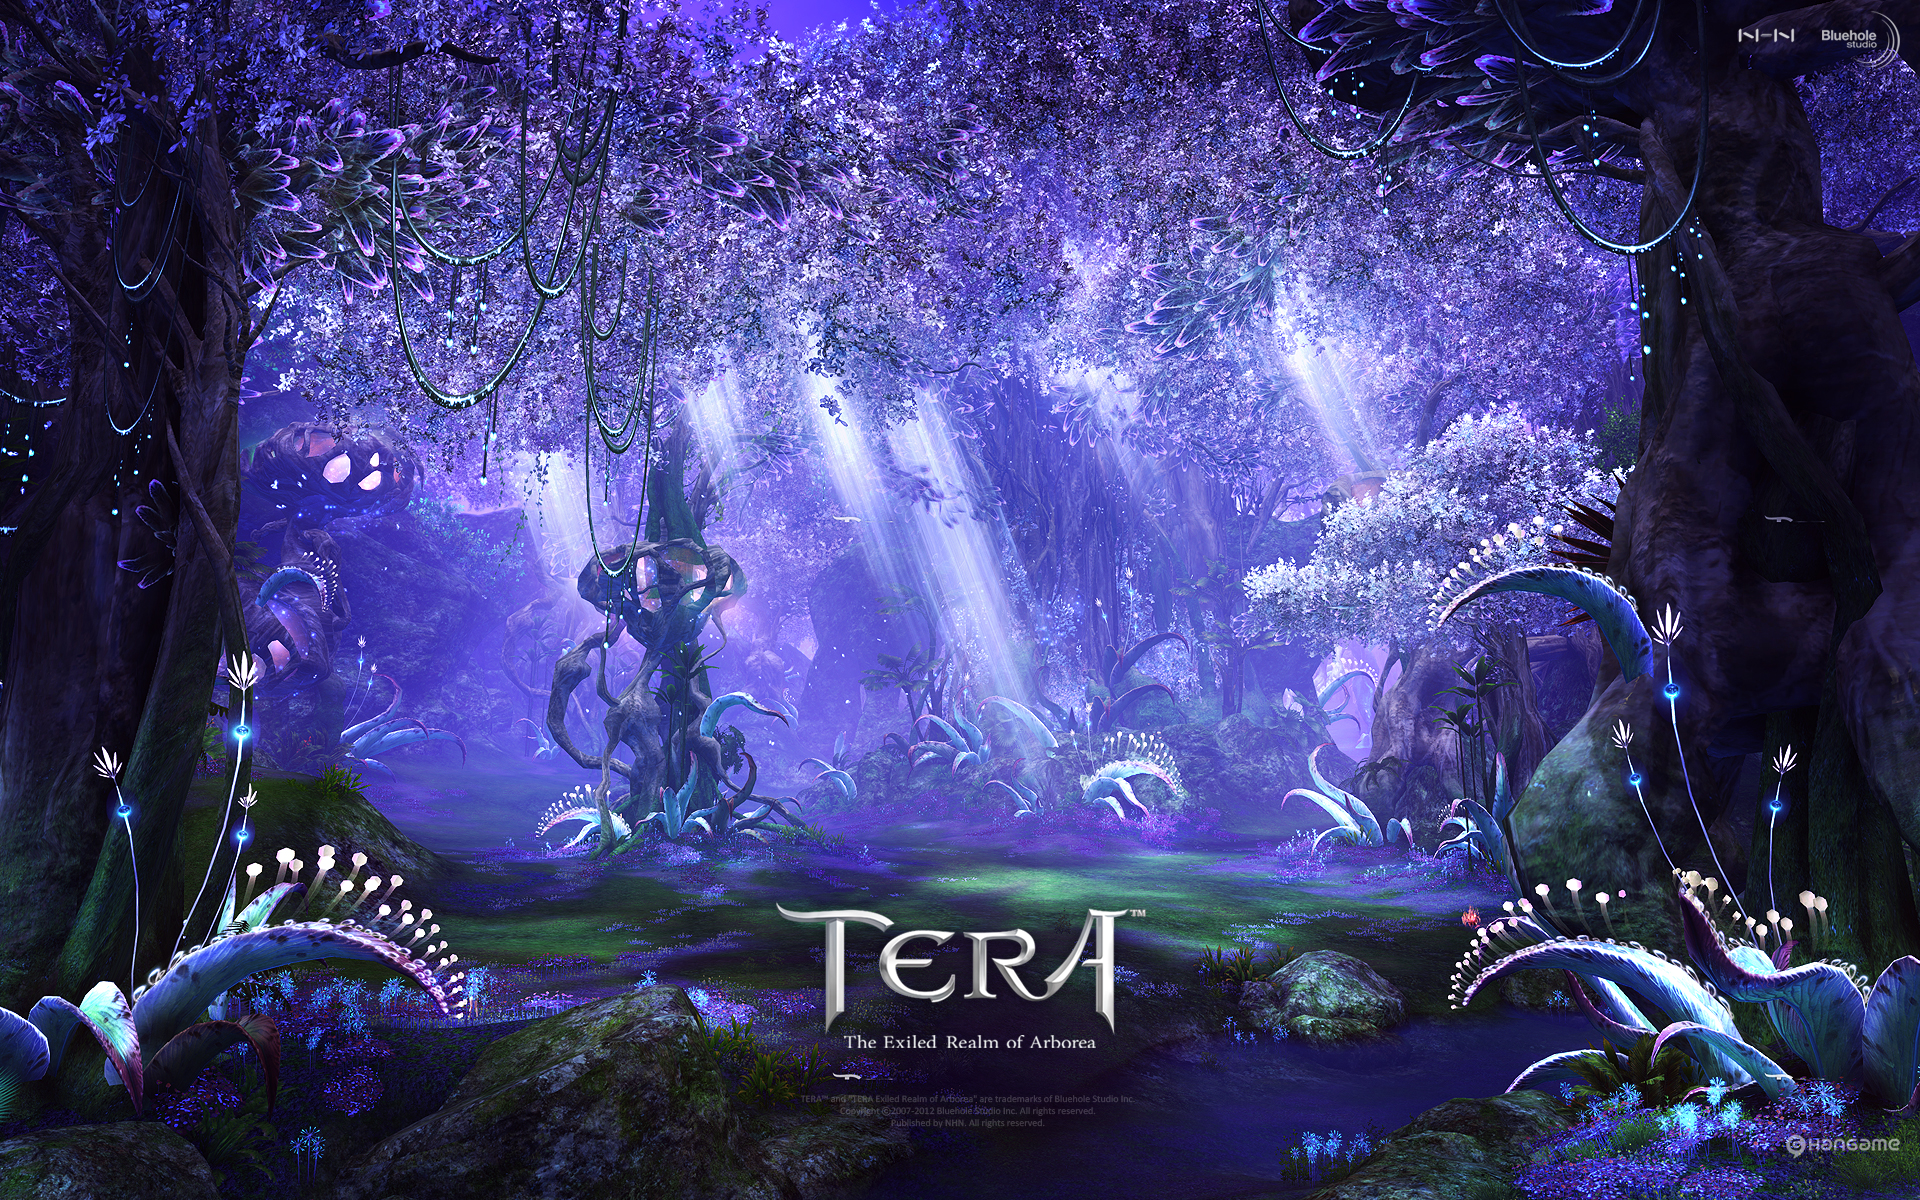 tera online fantasy anime v wallpaper 1920x1200 67846